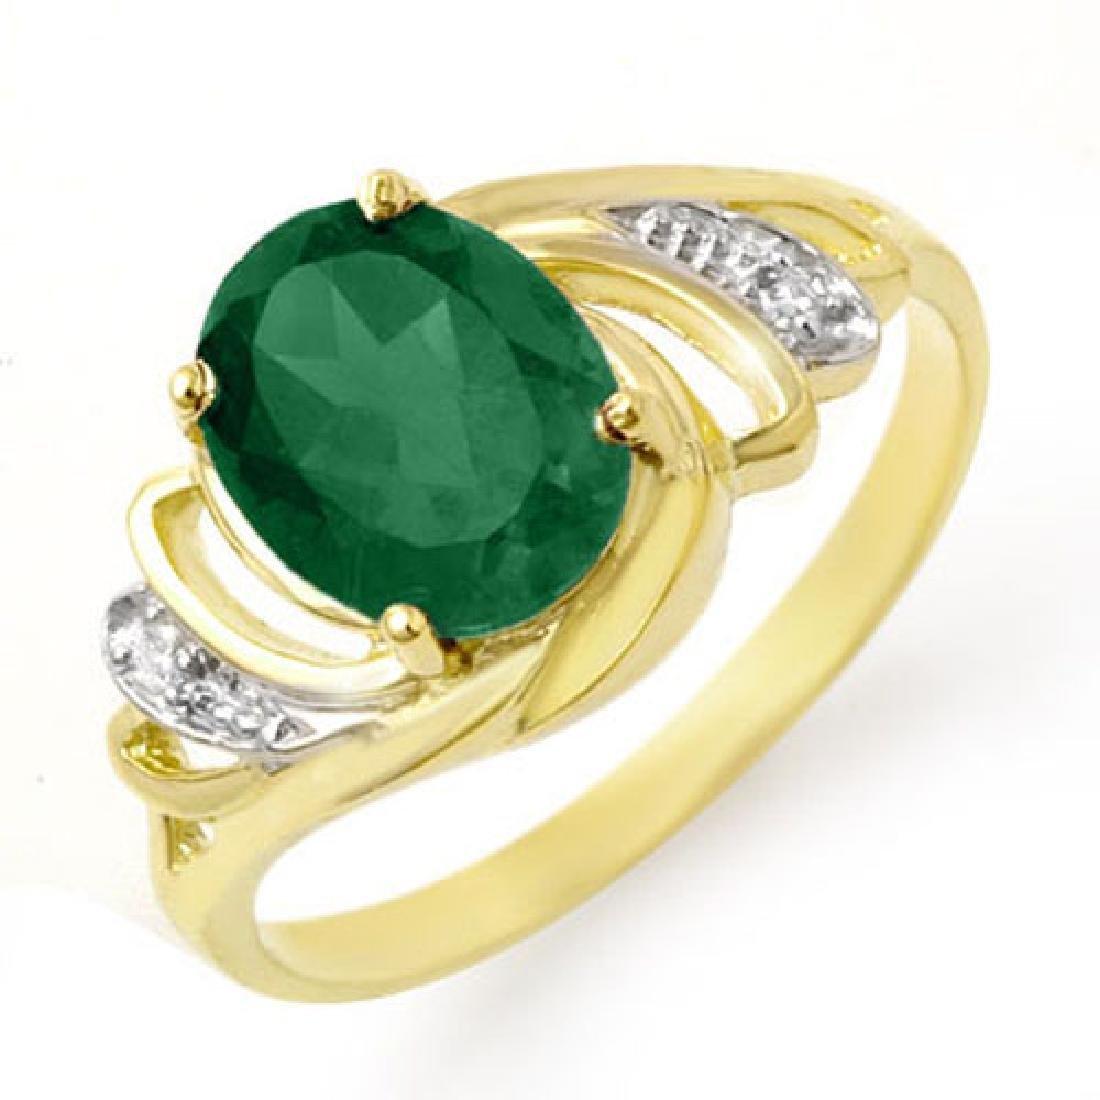 2.14 CTW Emerald & Diamond Ring 14K Yellow Gold